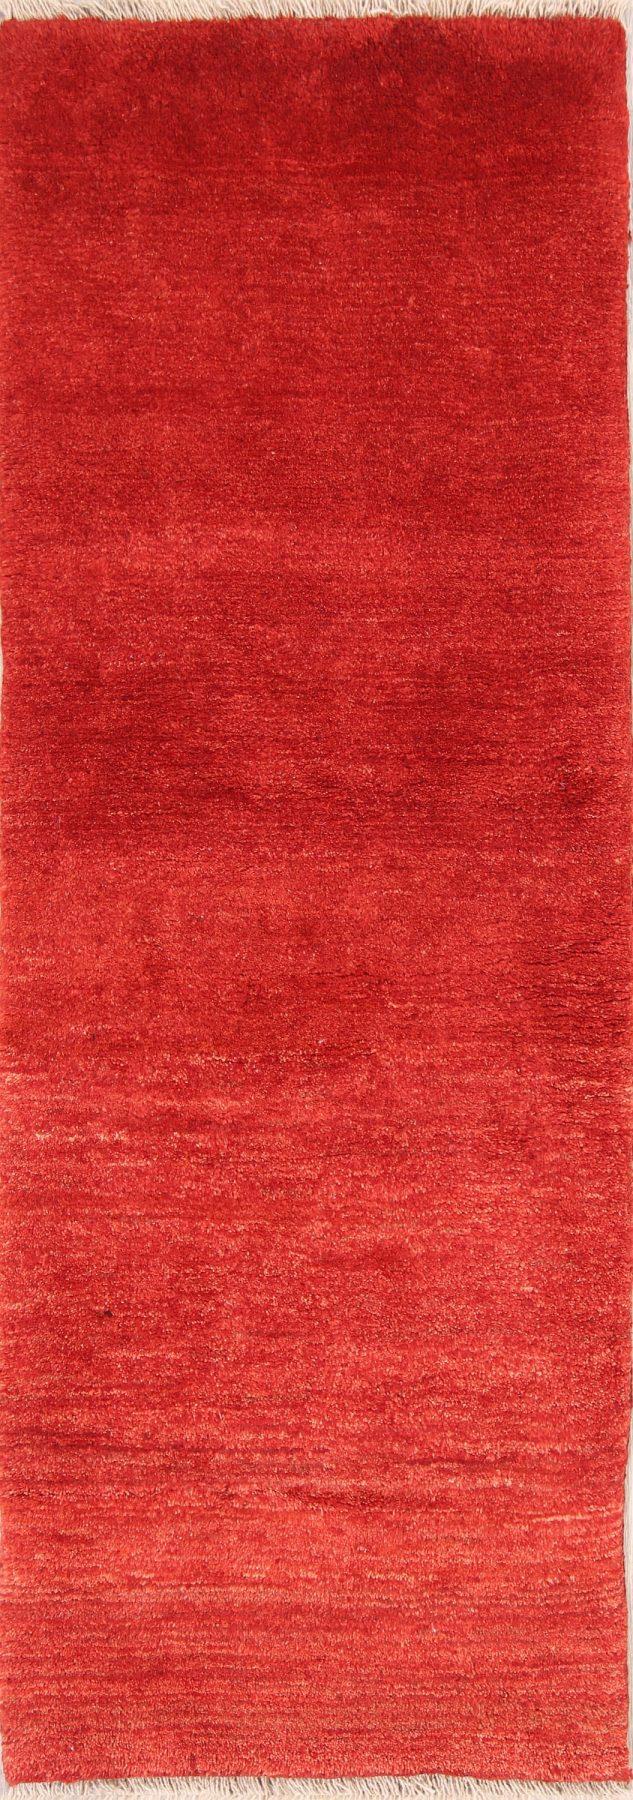 Modern Solid Red 2x6 Gabbeh Shiraz Persian Rug Runner